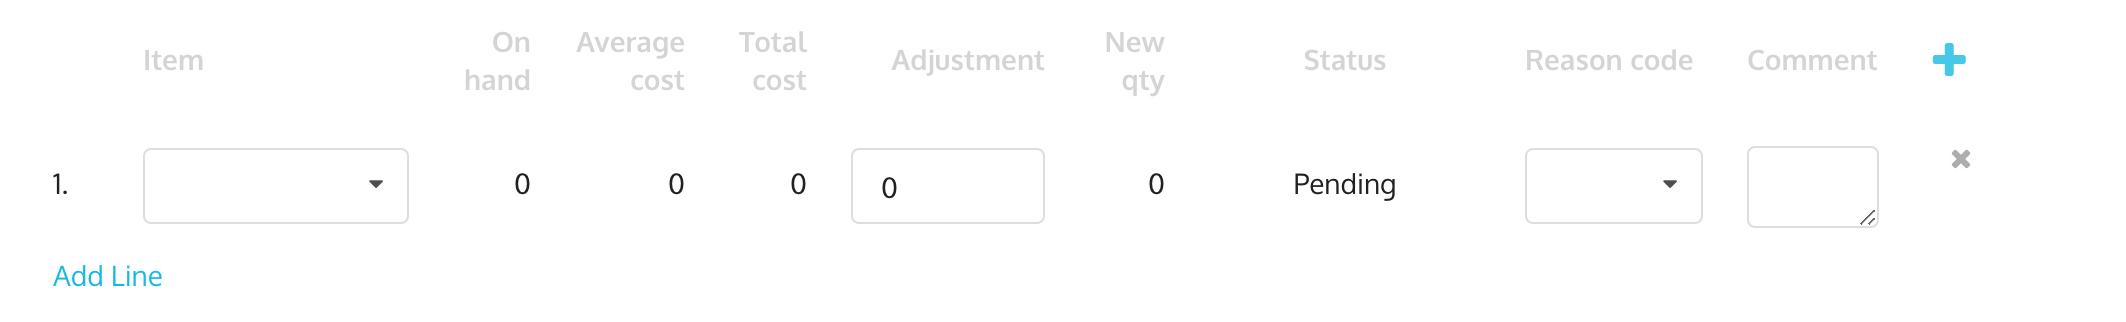 Inventory adjustment line